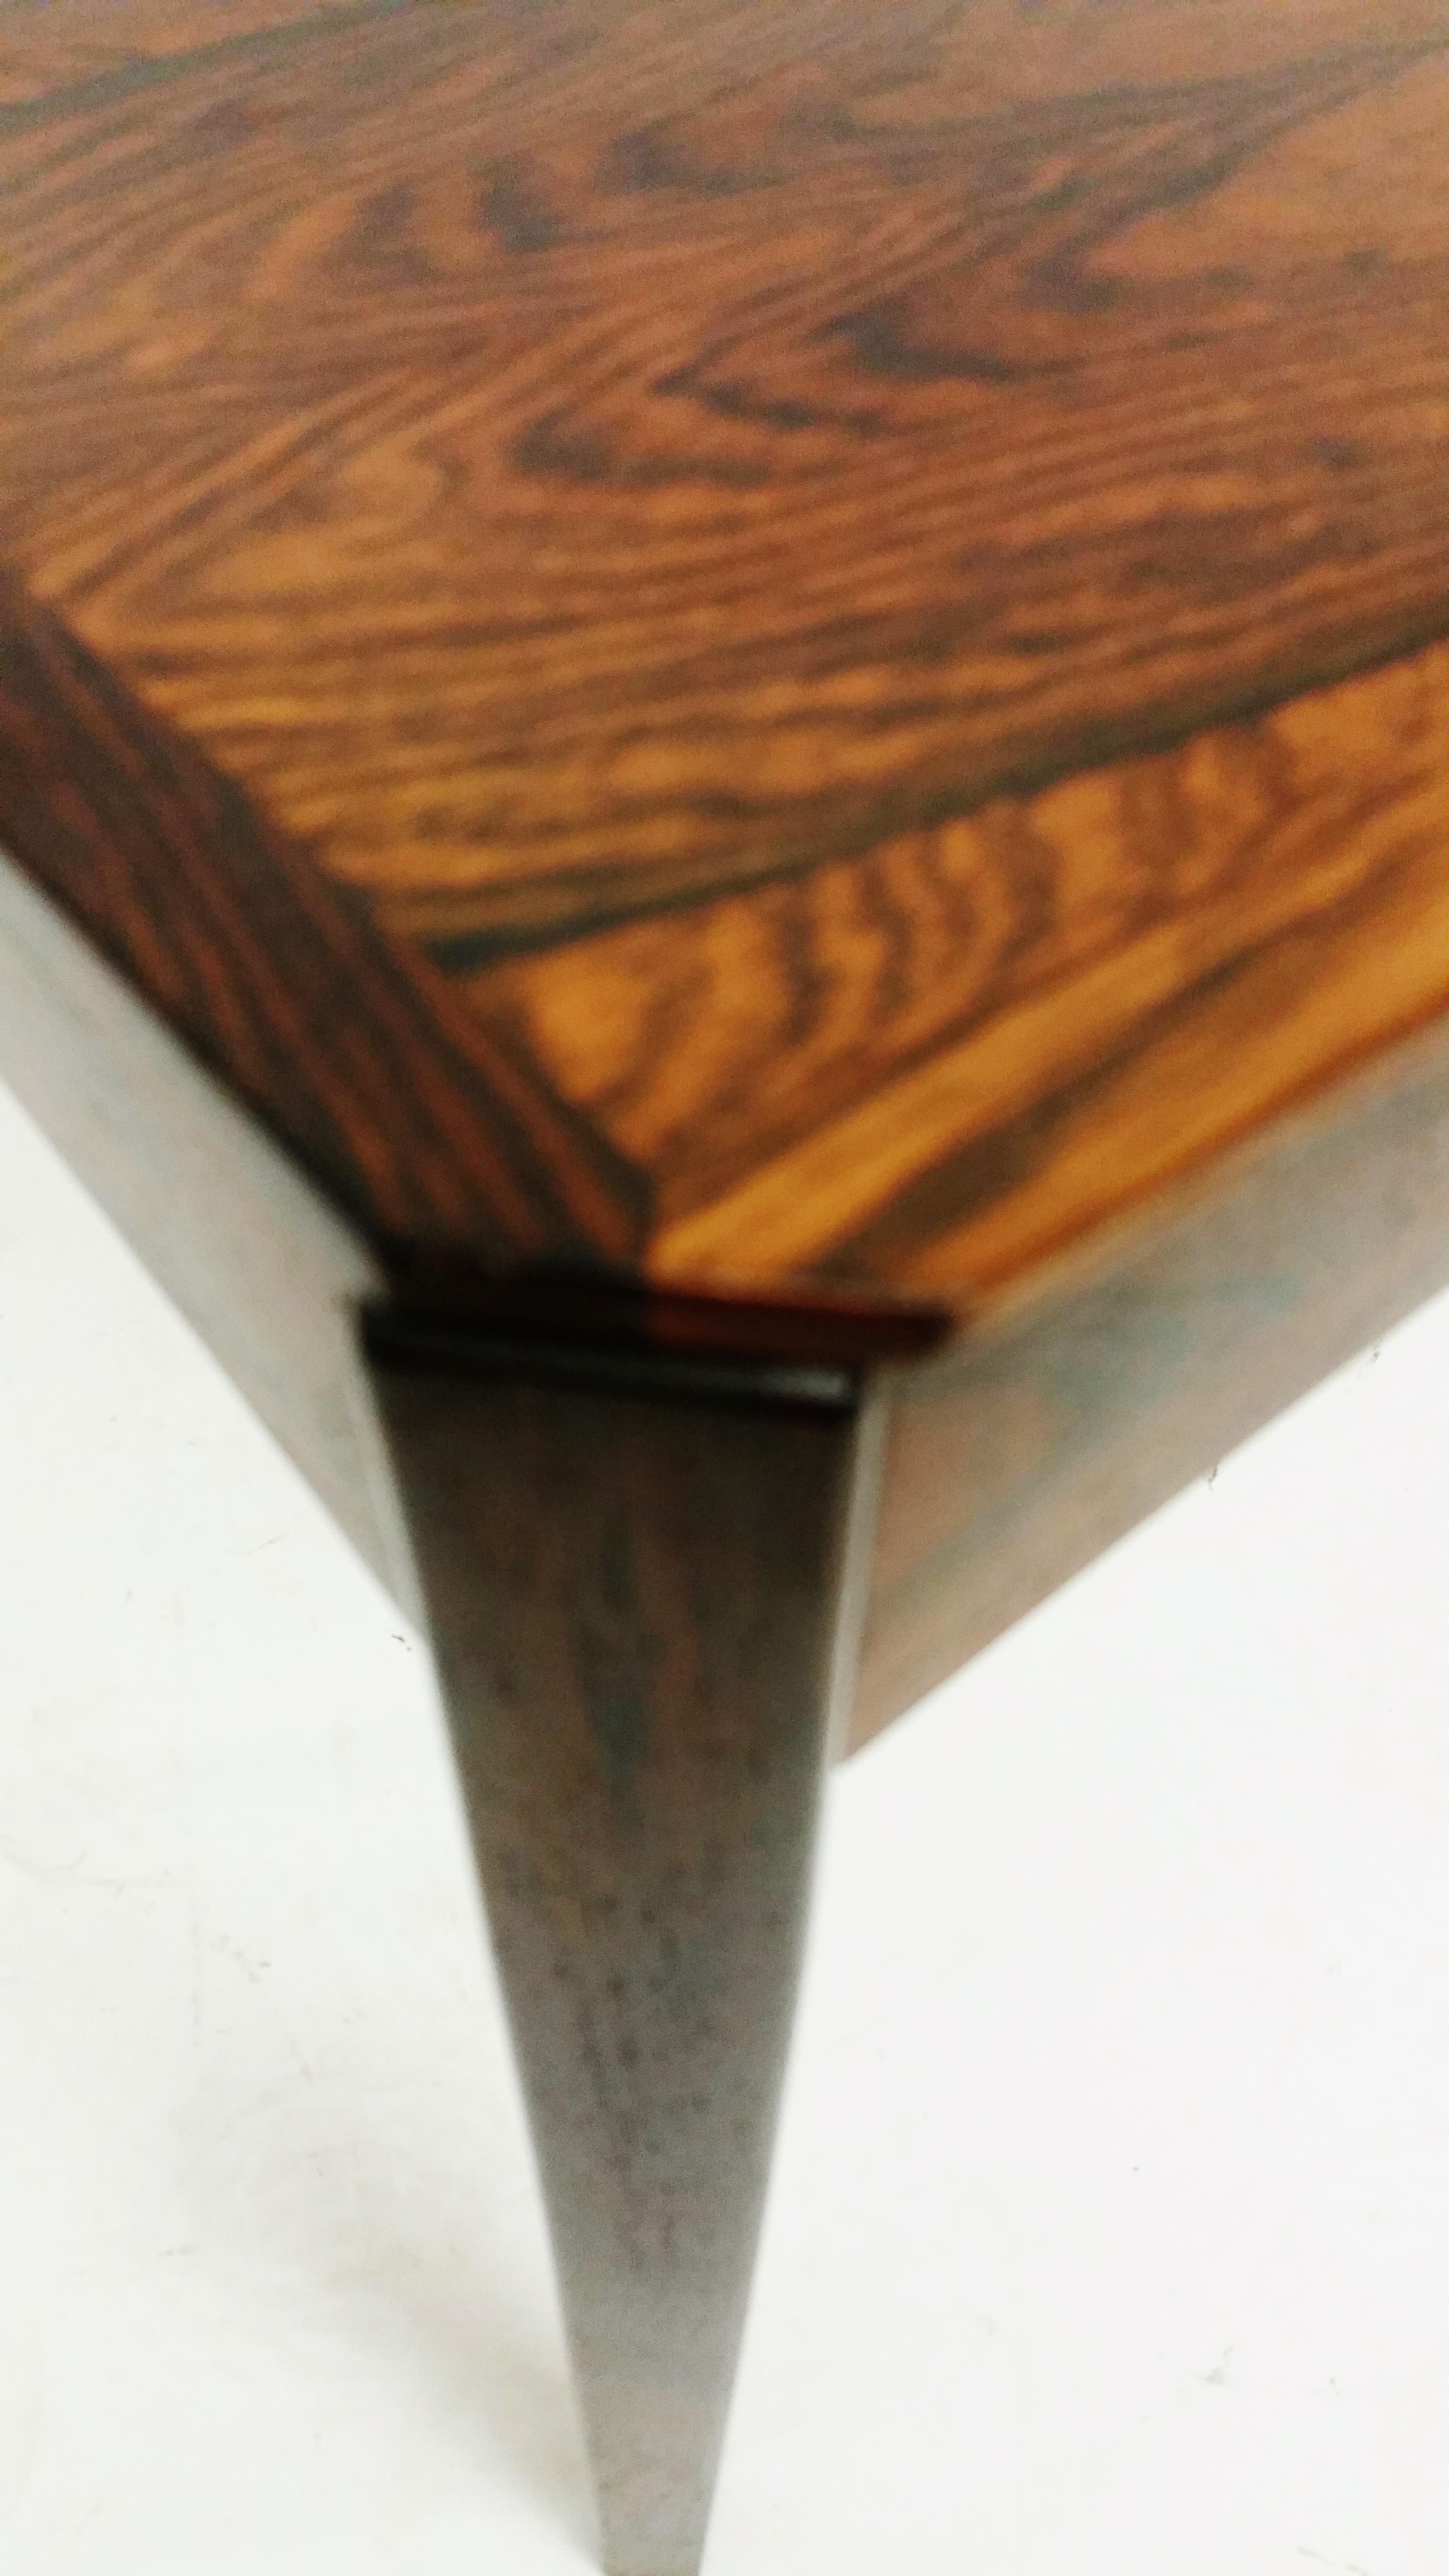 Rose wood coffee table